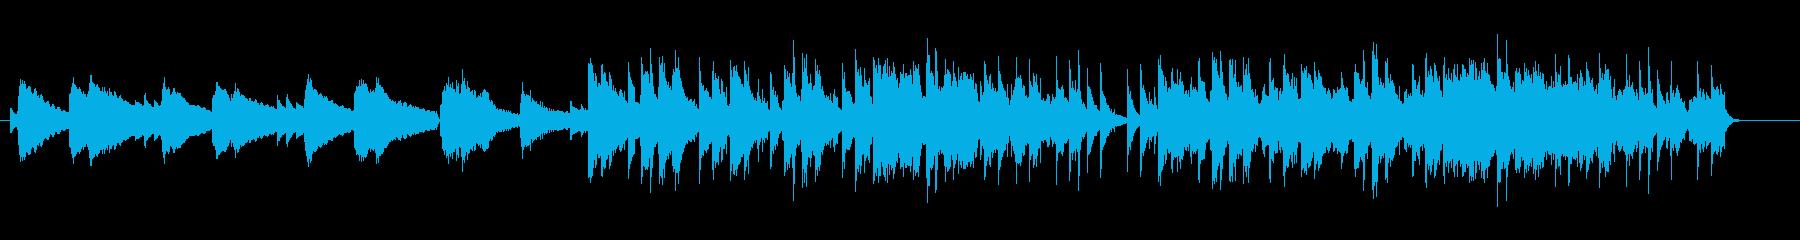 City popの再生済みの波形